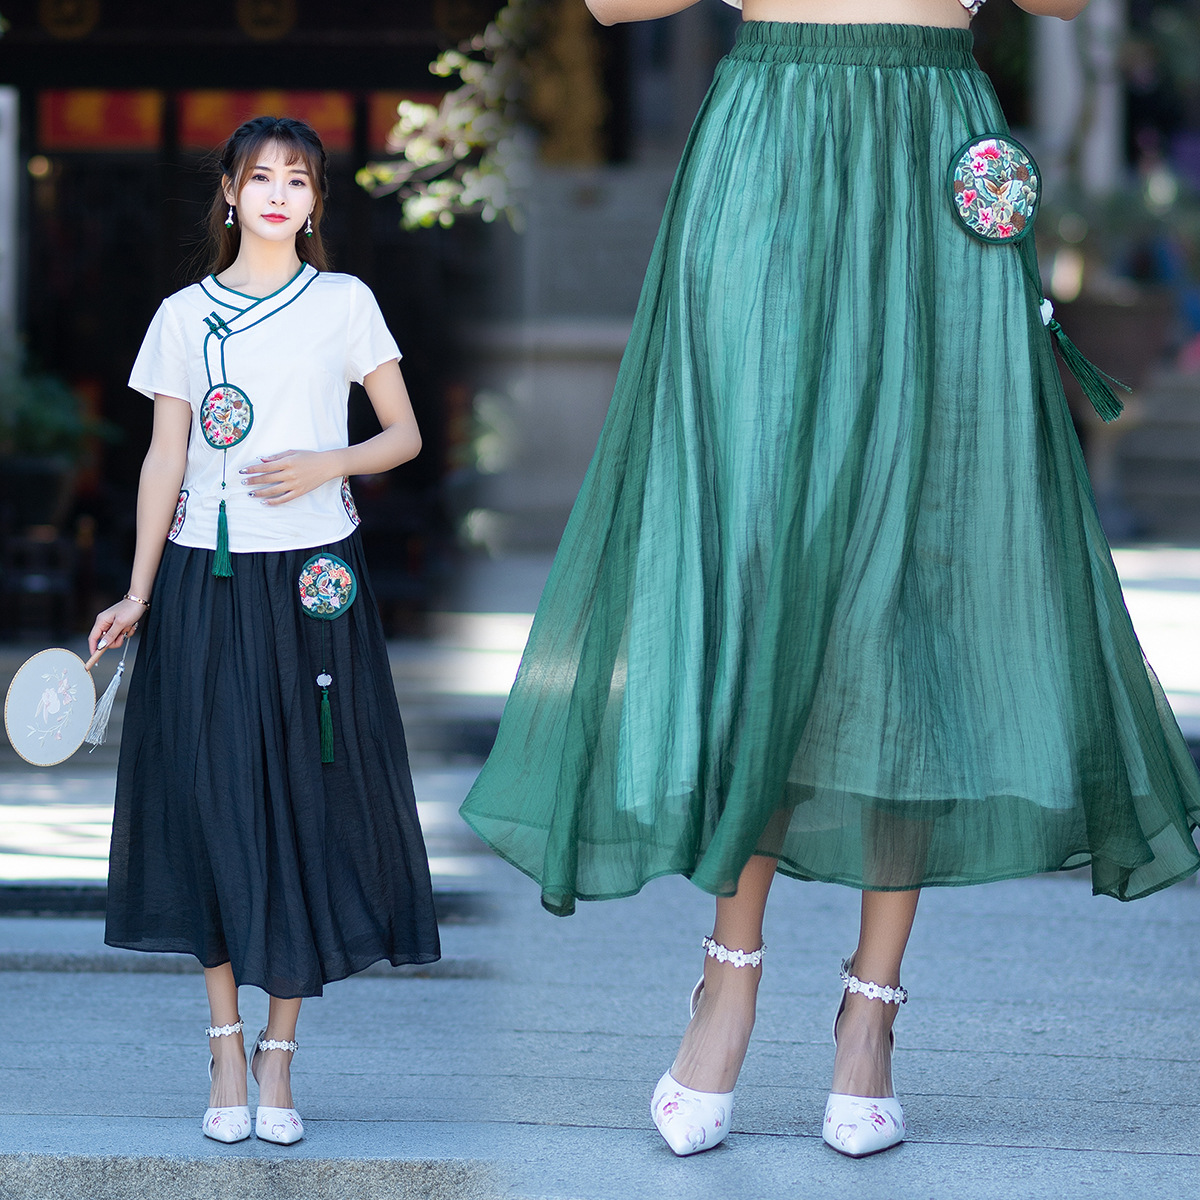 Sf0697 Feimina 2019 Spring New Style Ethnic-Style Big Hemline Embroidery Skirt